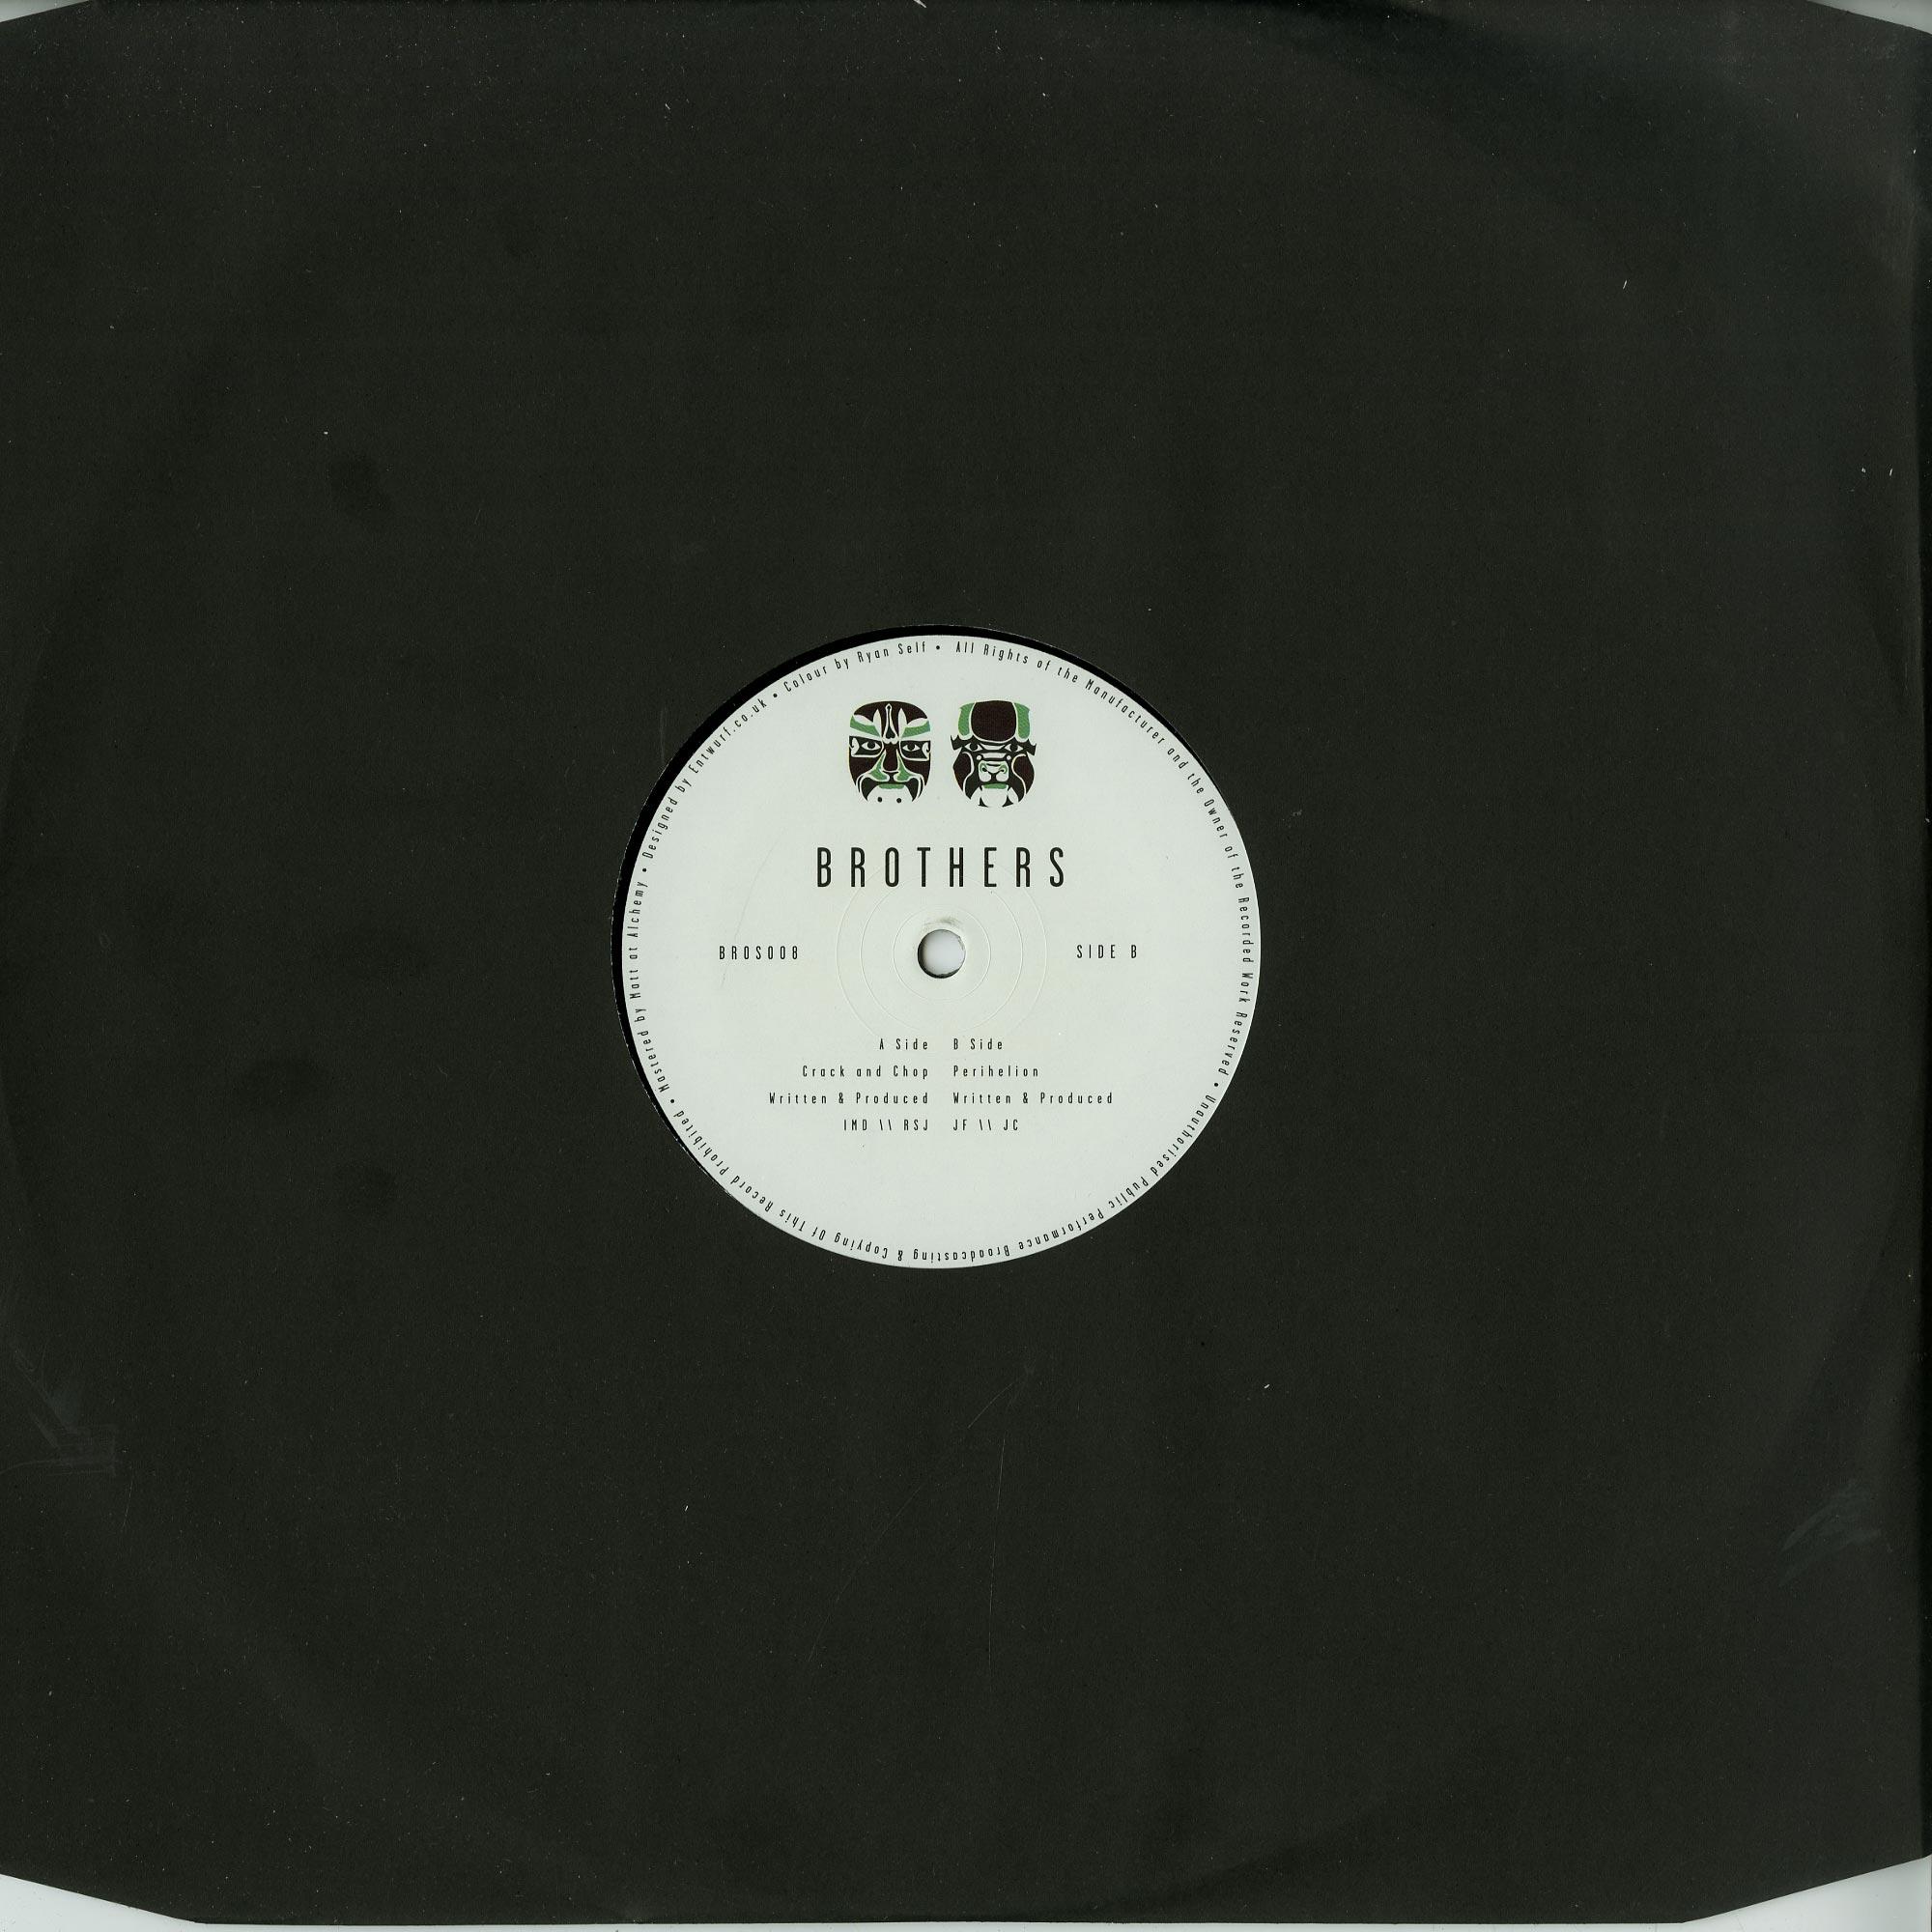 EOMAC, RORY ST JOHN & JOE FARR, WITCH - BROS008